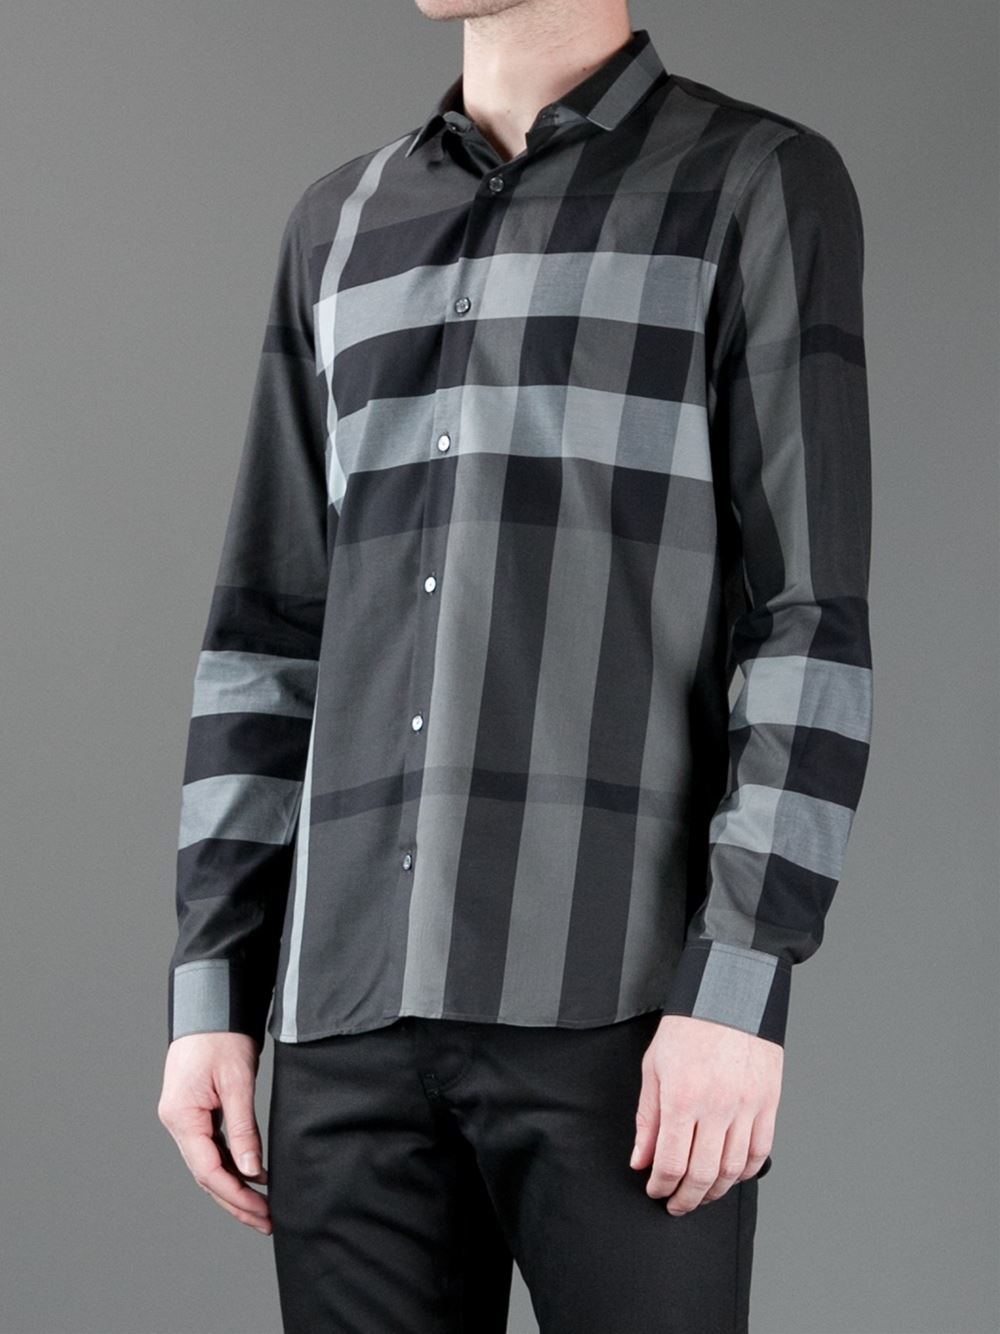 168974e89cee Burberry Pembury Shirt in Black for Men - Lyst